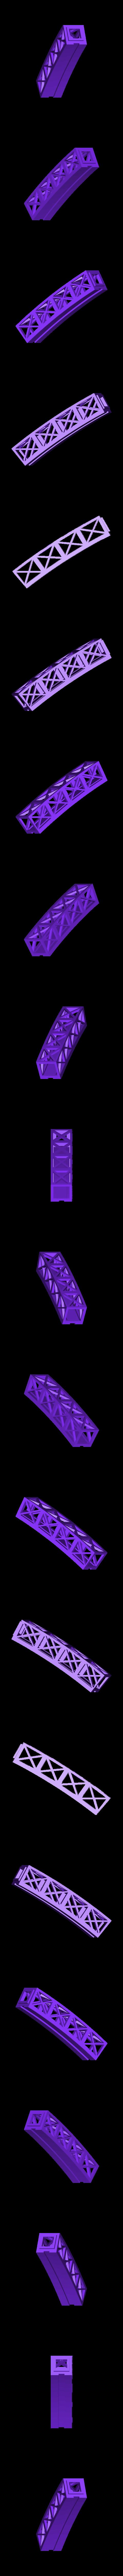 SEG_E-5.stl Download free STL file LED bridge lamp • Model to 3D print, Opossums